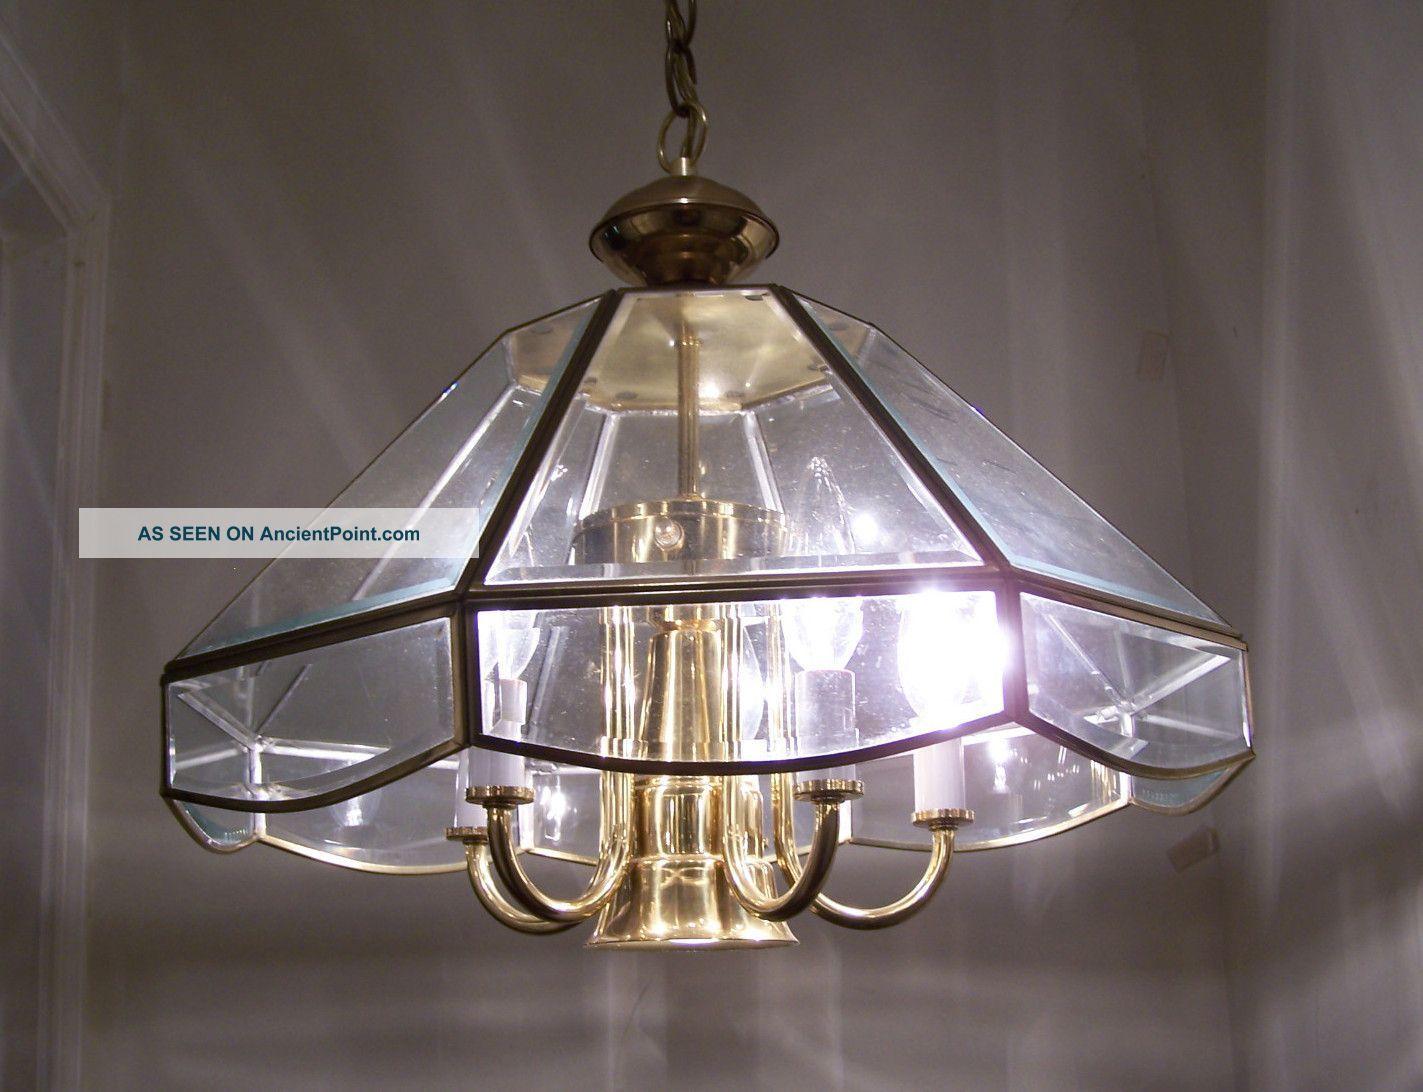 90s light fixture mary macgregor inspiration pinterest 90s light fixture mozeypictures Gallery